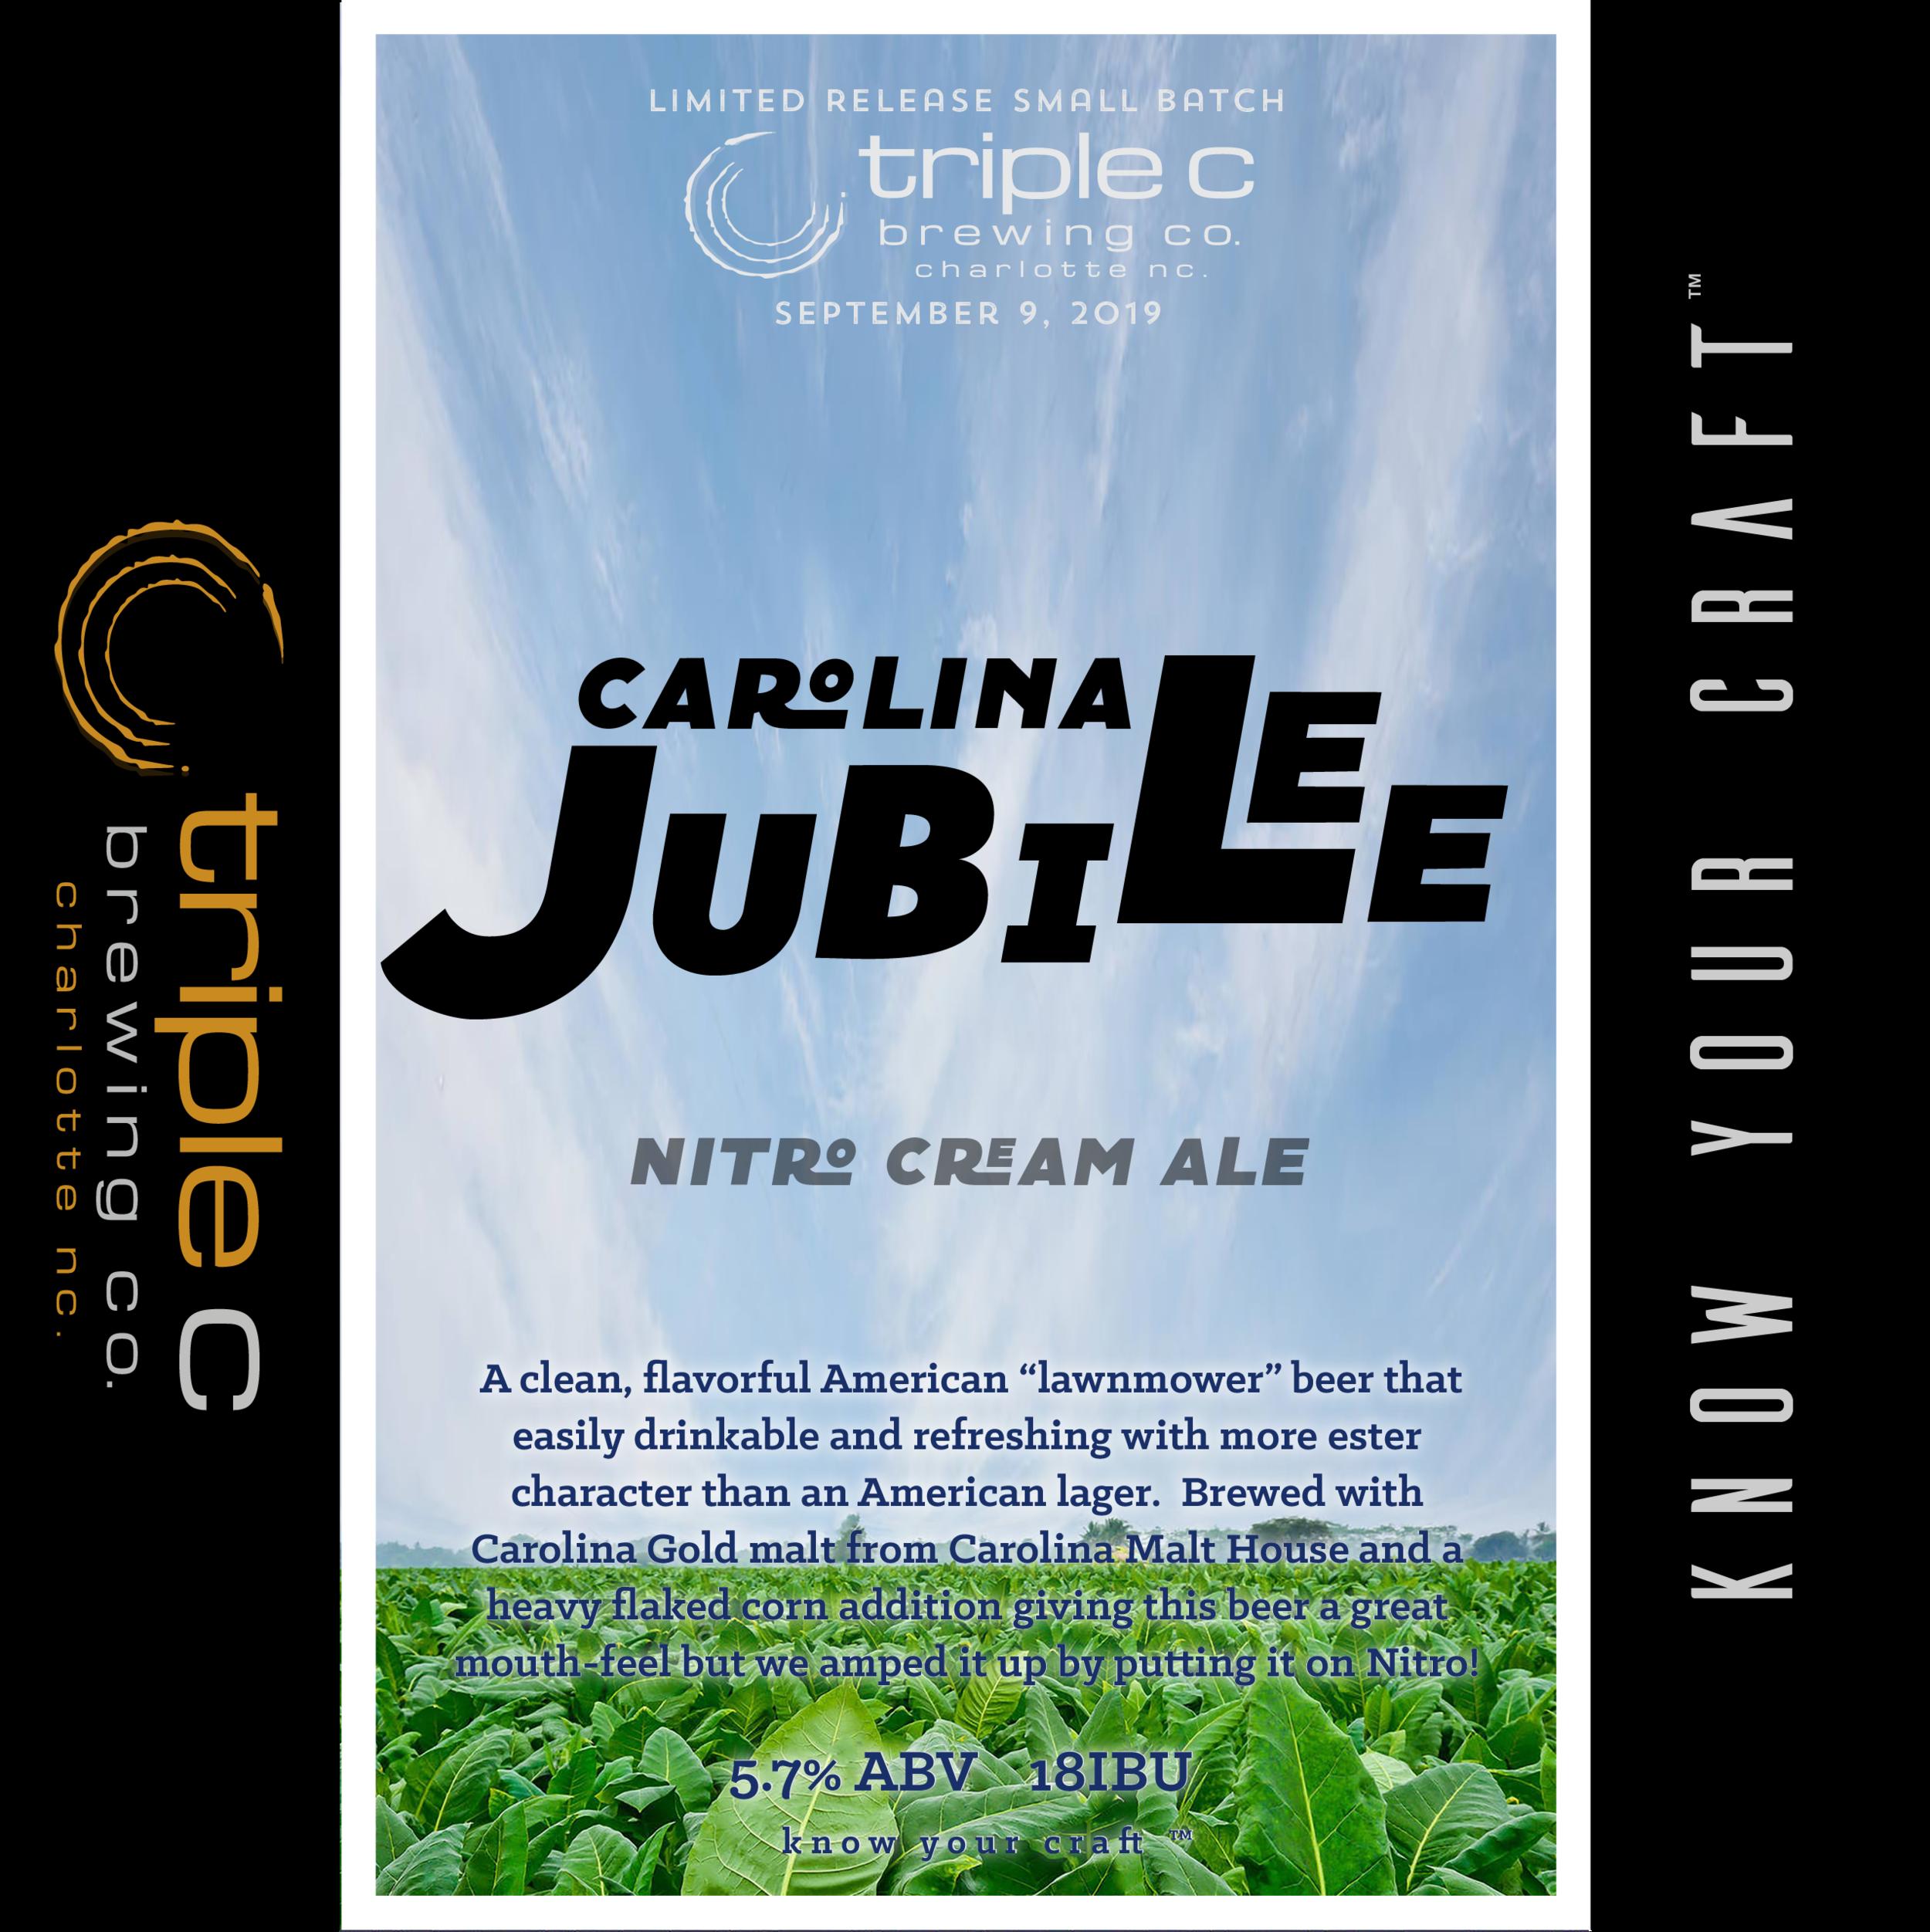 CarolinaJubilee_Media2.png